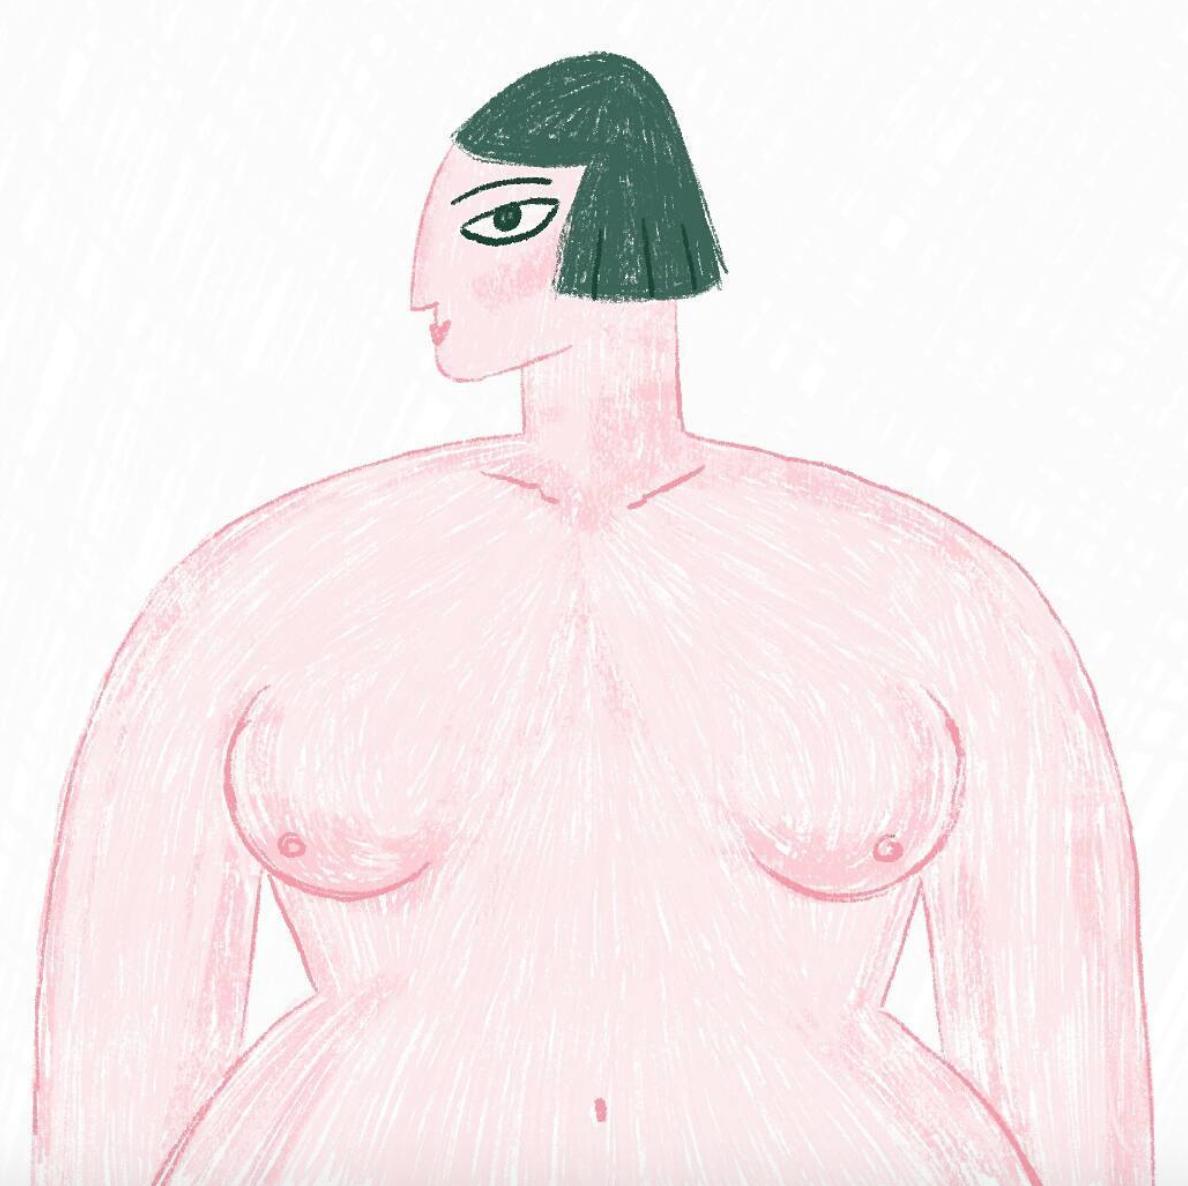 Illustration by: Kristin Smith  @Skristinnsmith